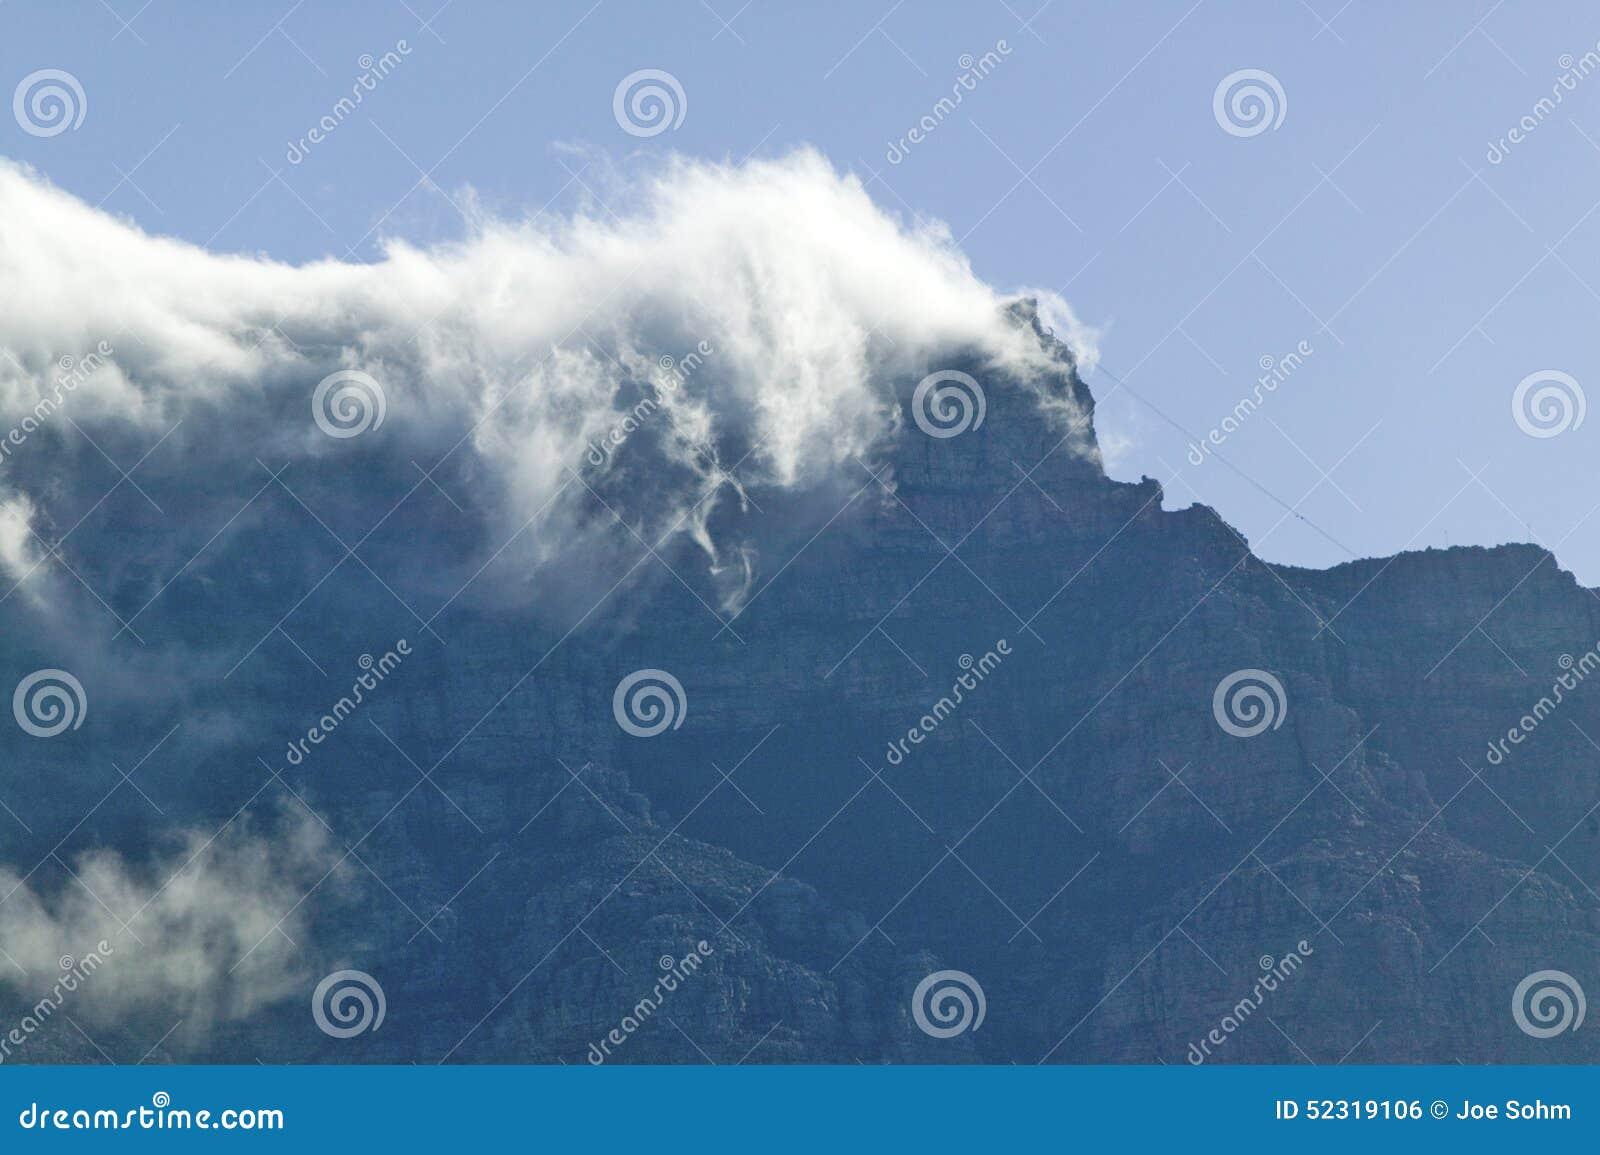 Wolkenslag over Lijstberg en bergen achter Cape Town, Zuid-Afrika